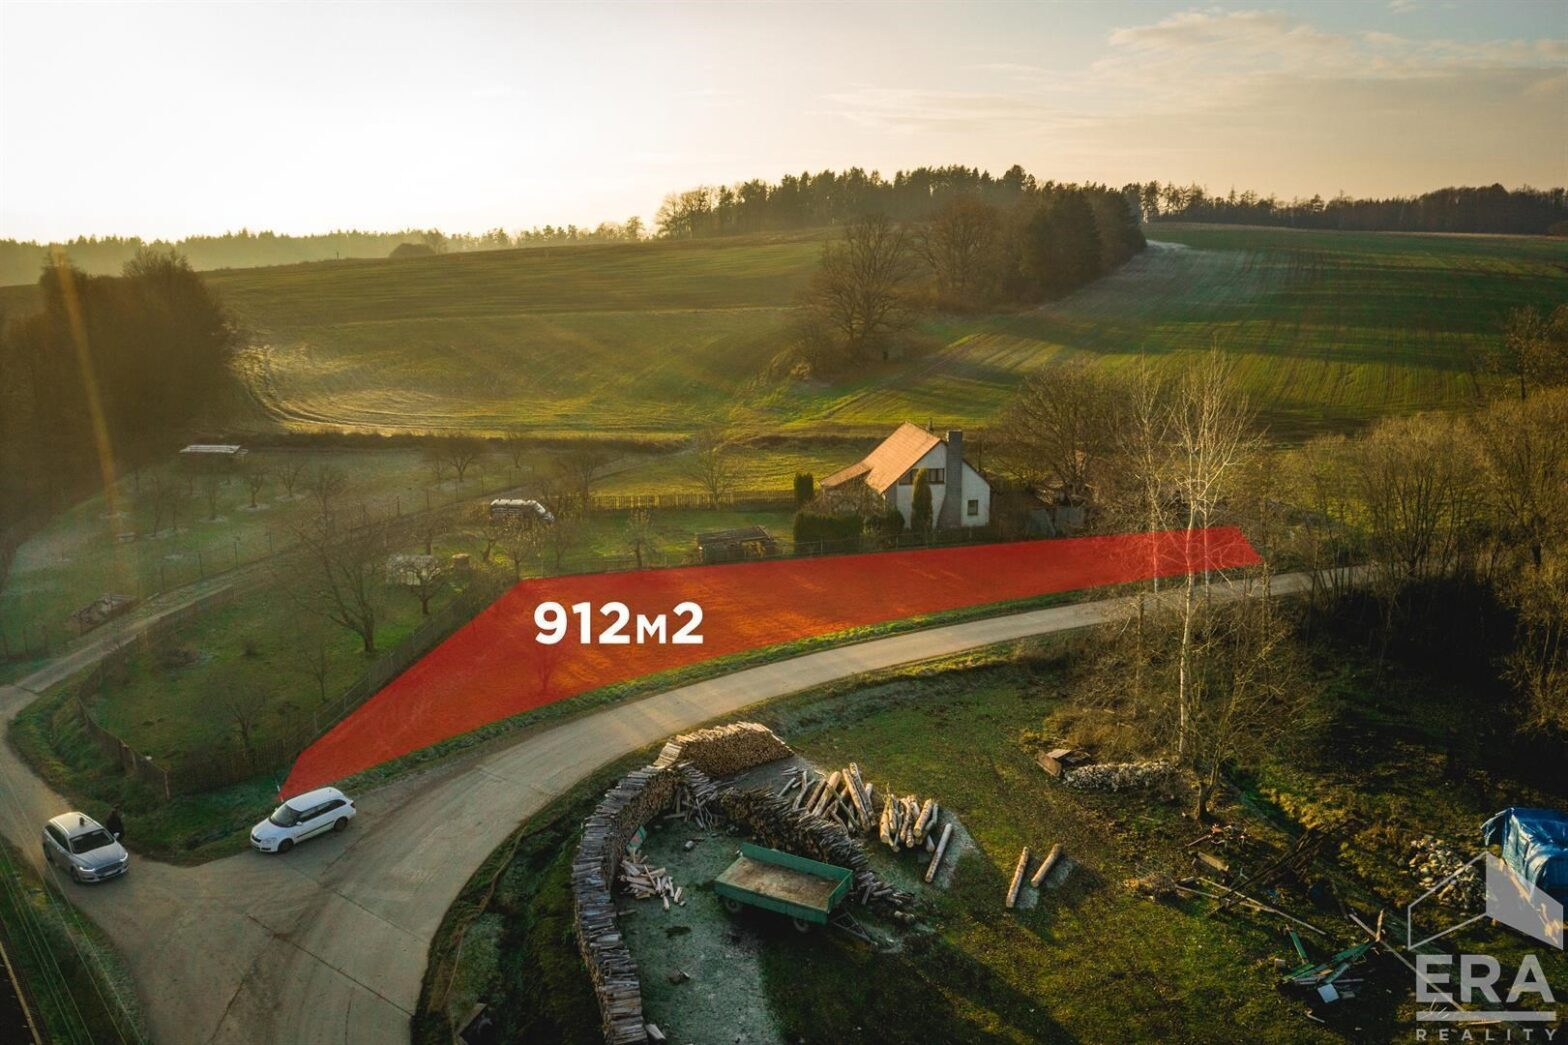 Prodej stavebního pozemku, 912 m2, Držkrajov